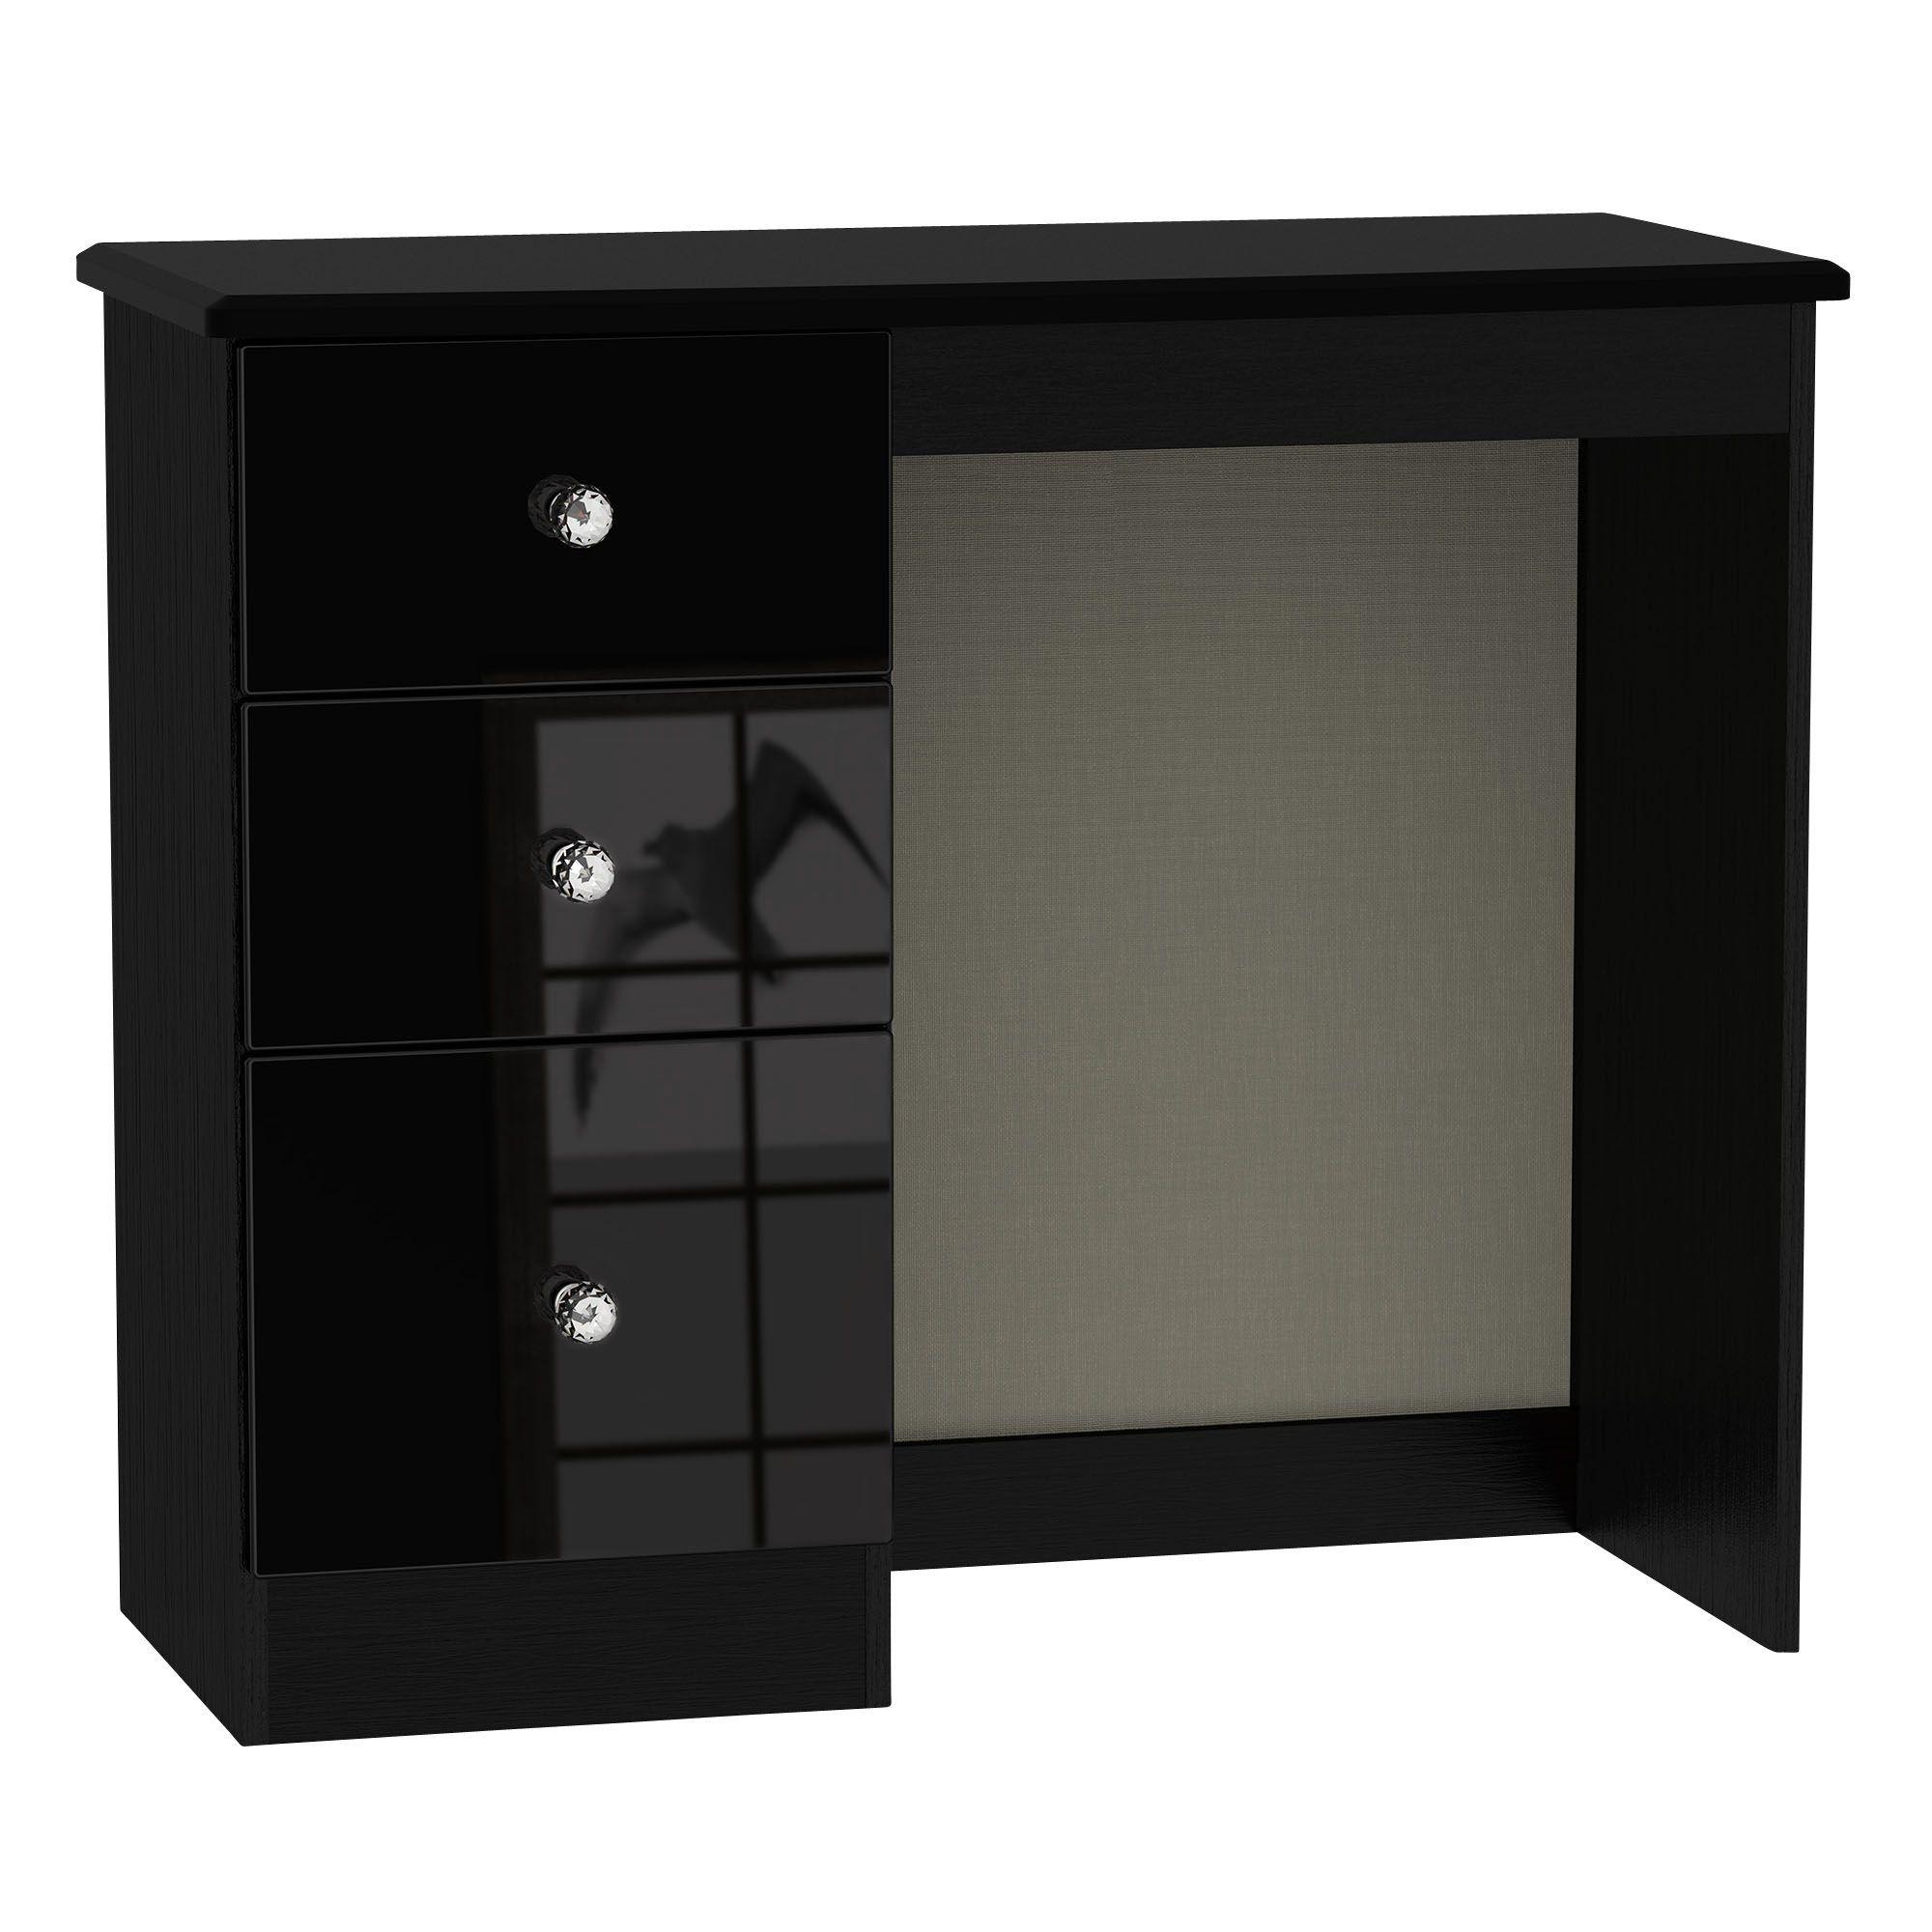 Ordinaire Noire Black High Gloss Dressing Table (H)800mm (W)930mm (D)410mm |  Departments | DIY At Bu0026Q